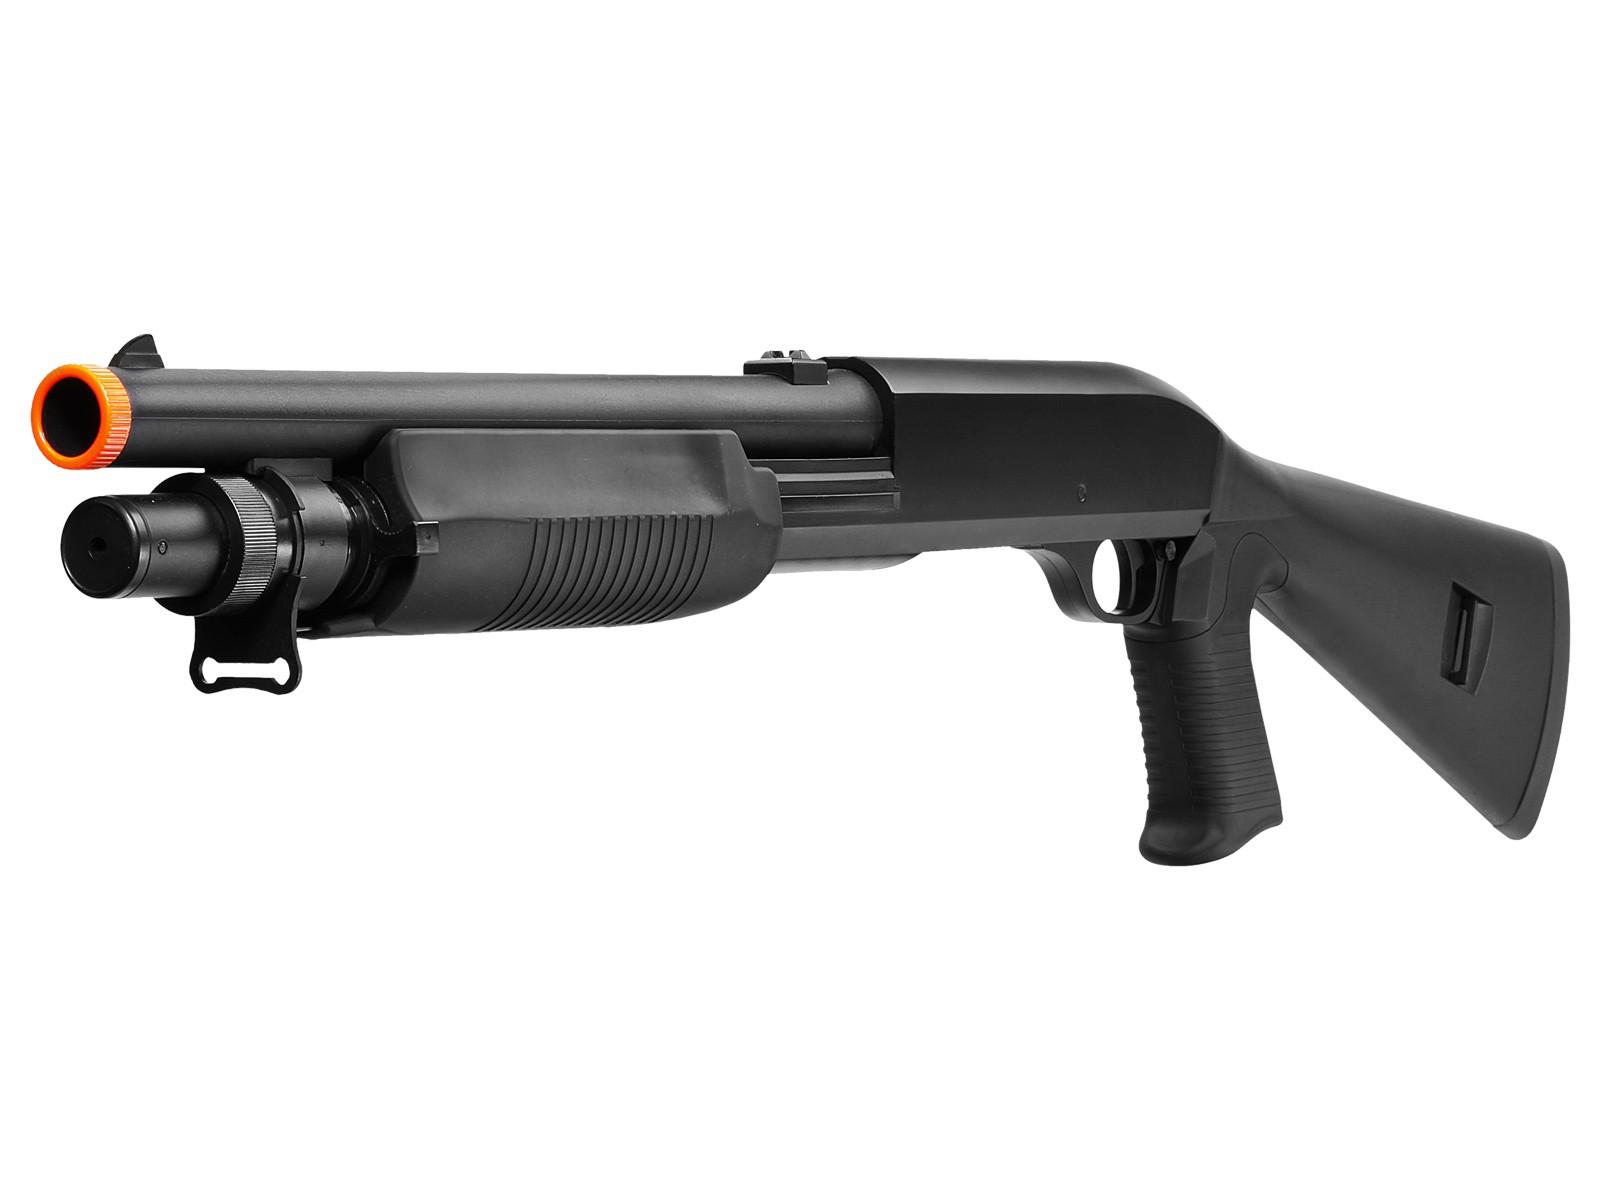 MultiShot_Combat_Tactical_Shotgun_6mm